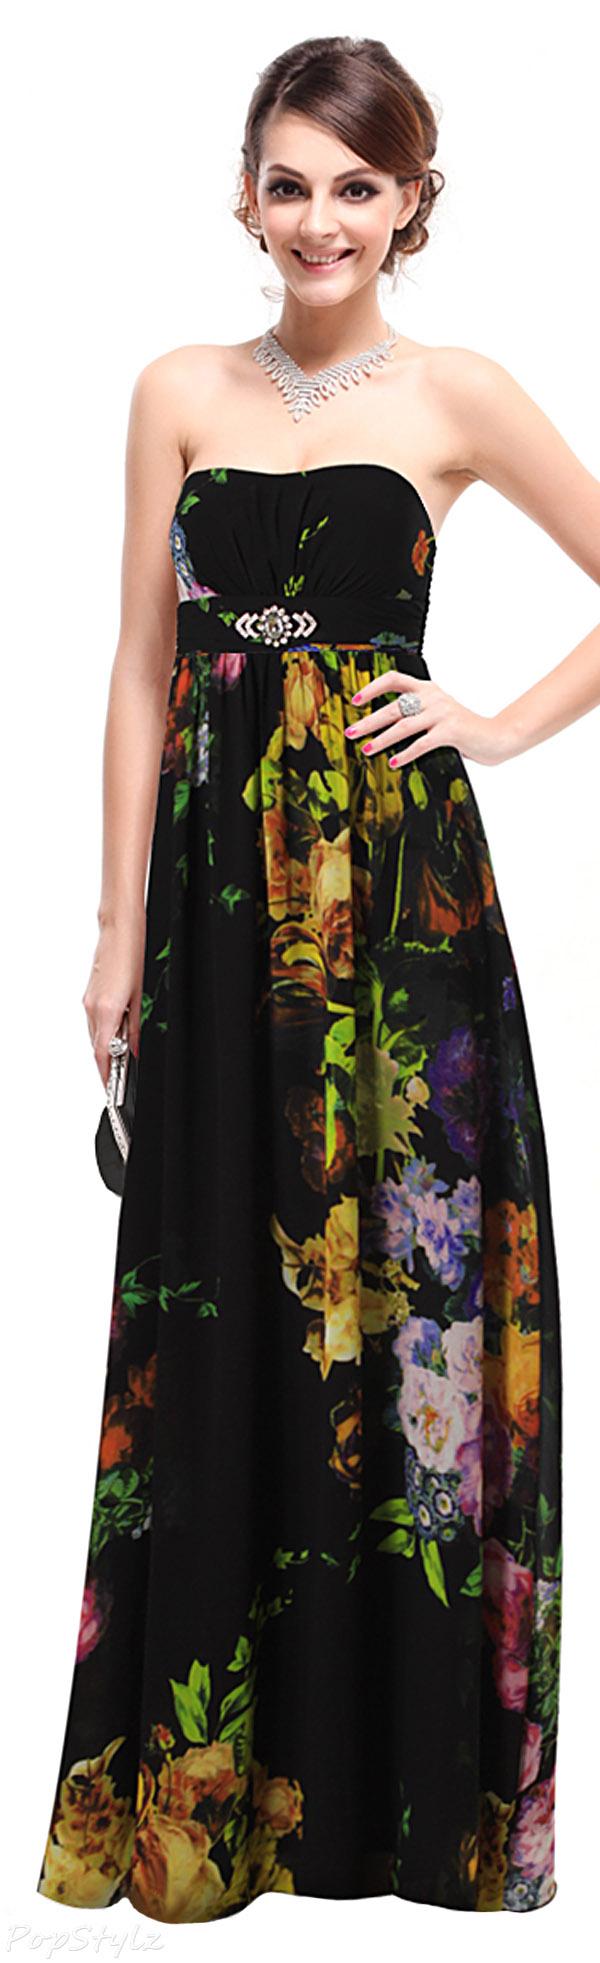 Floral Maxi Evening Dress